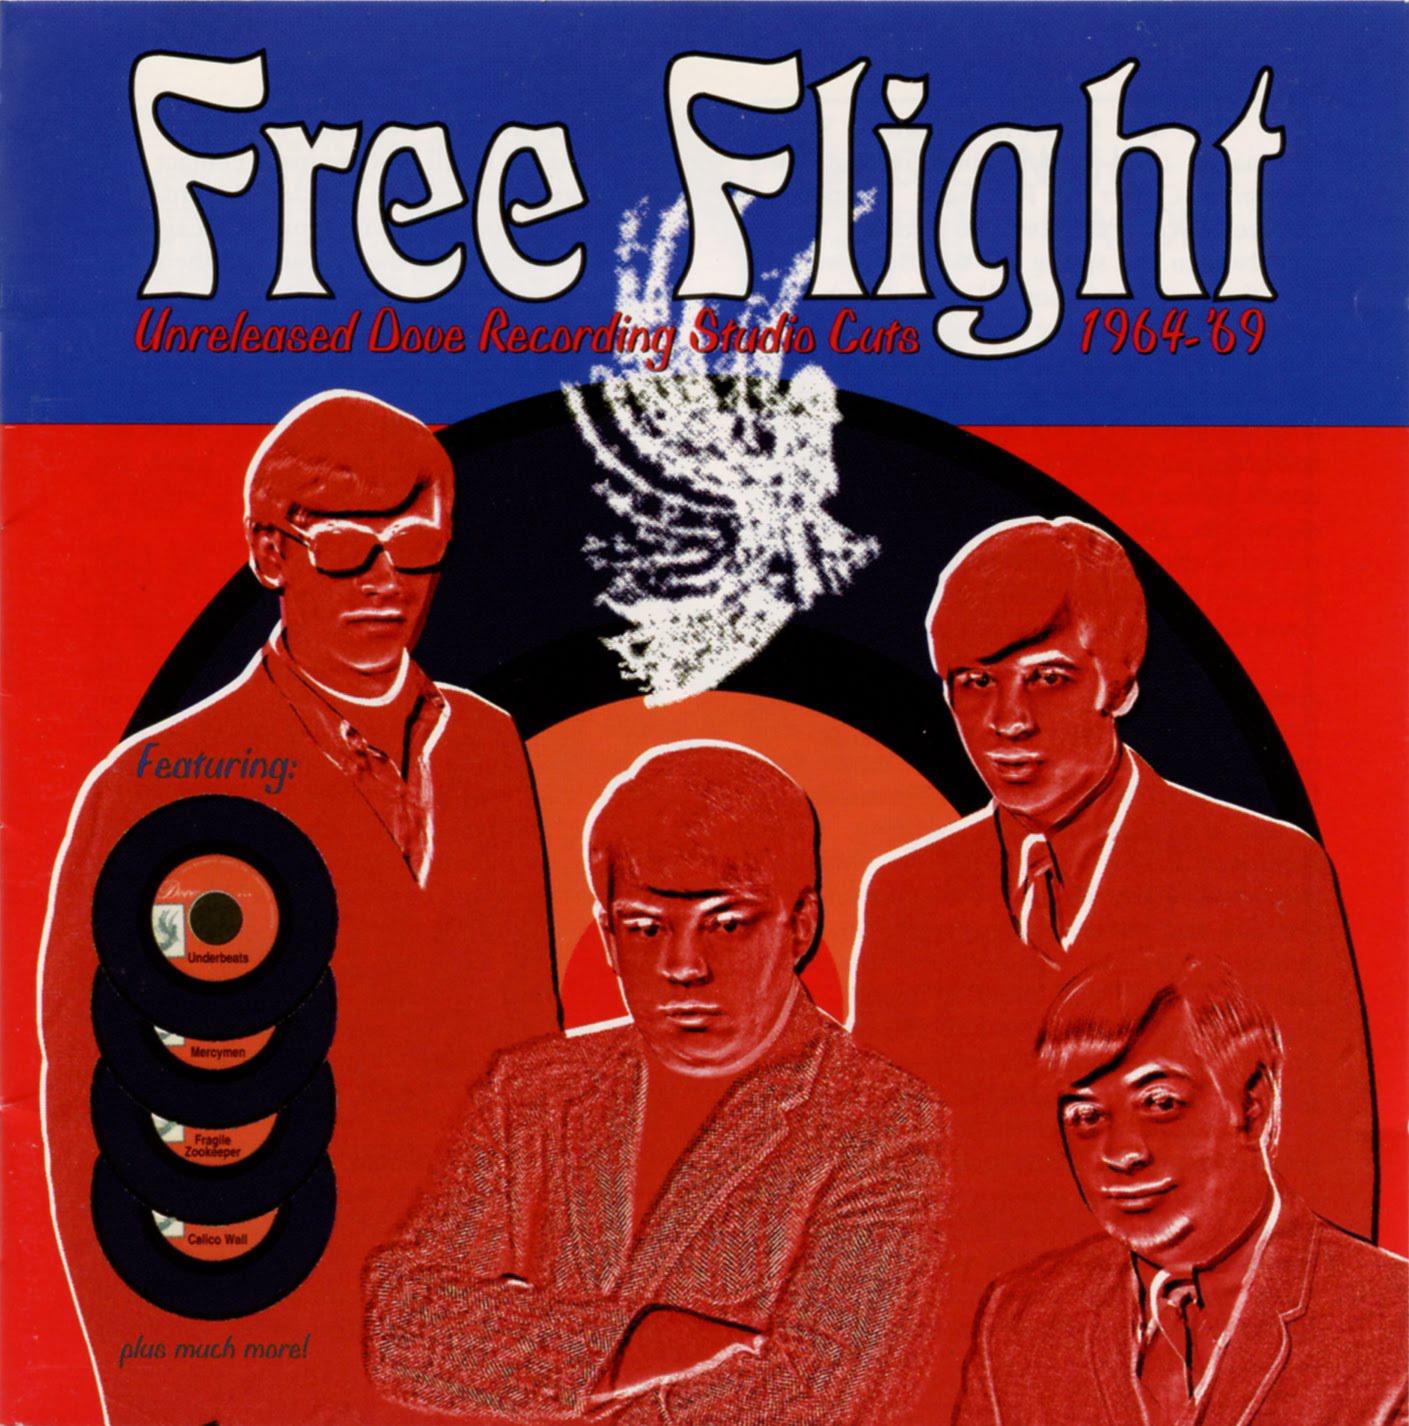 Various – Free Flight – Unreleased Dove Recording Studio Cuts 1964-'69 Garage Rock Psychedelic Music Album Compilation